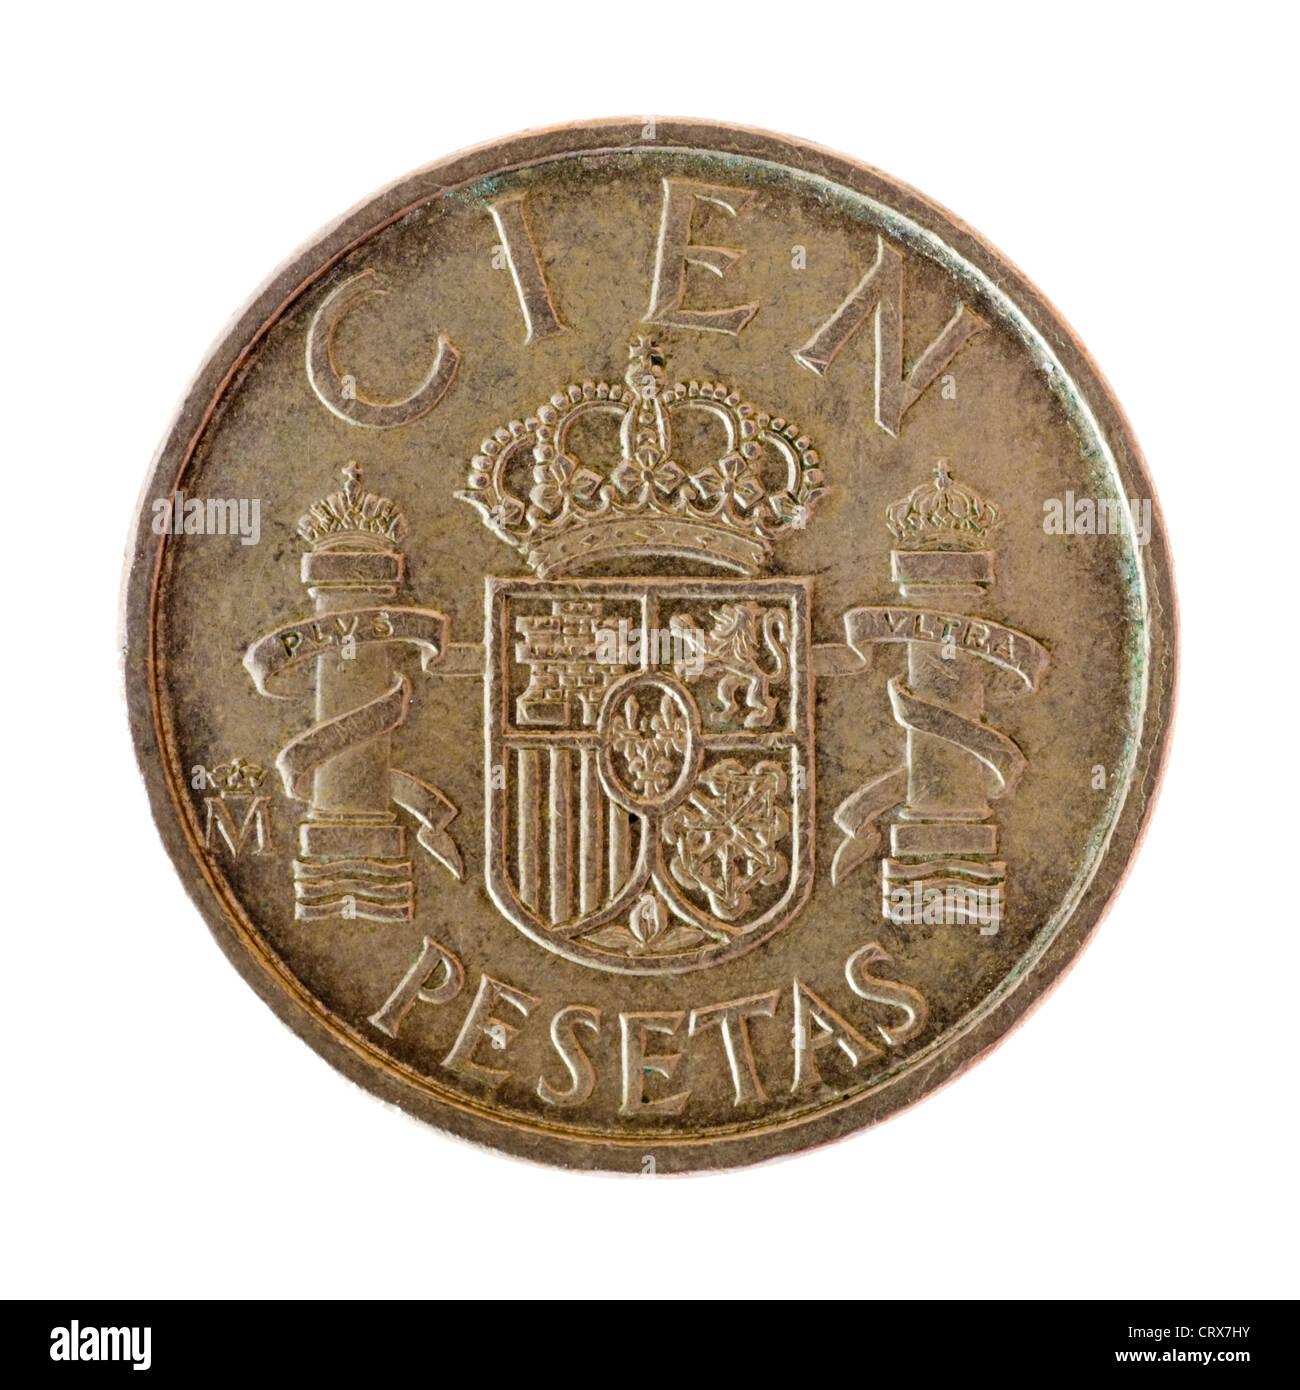 Old Spanish Pesetas coin - Stock Image